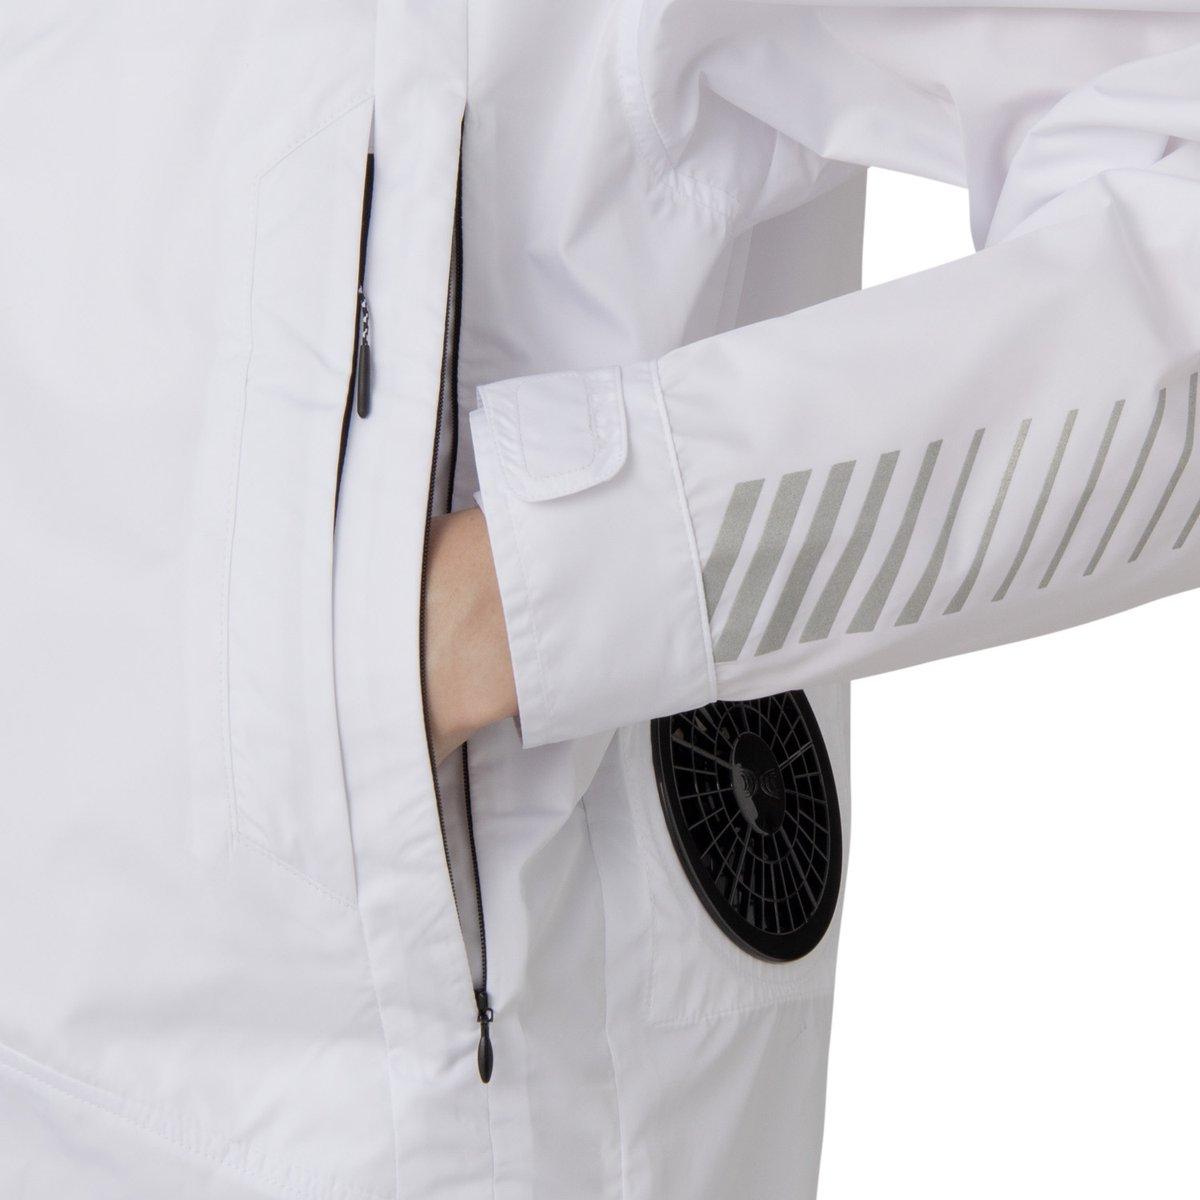 test ツイッターメディア - 「アシックス」が小型のファン付きウェアを発売。熱を感知する神経が集中する手元を冷やして体感温度を効率良く下げる設計を採用。夏場の運動時、インターバルや運動後の体温調整に活躍。 https://t.co/swhxUG5Sit https://t.co/lWPDBOgV3C